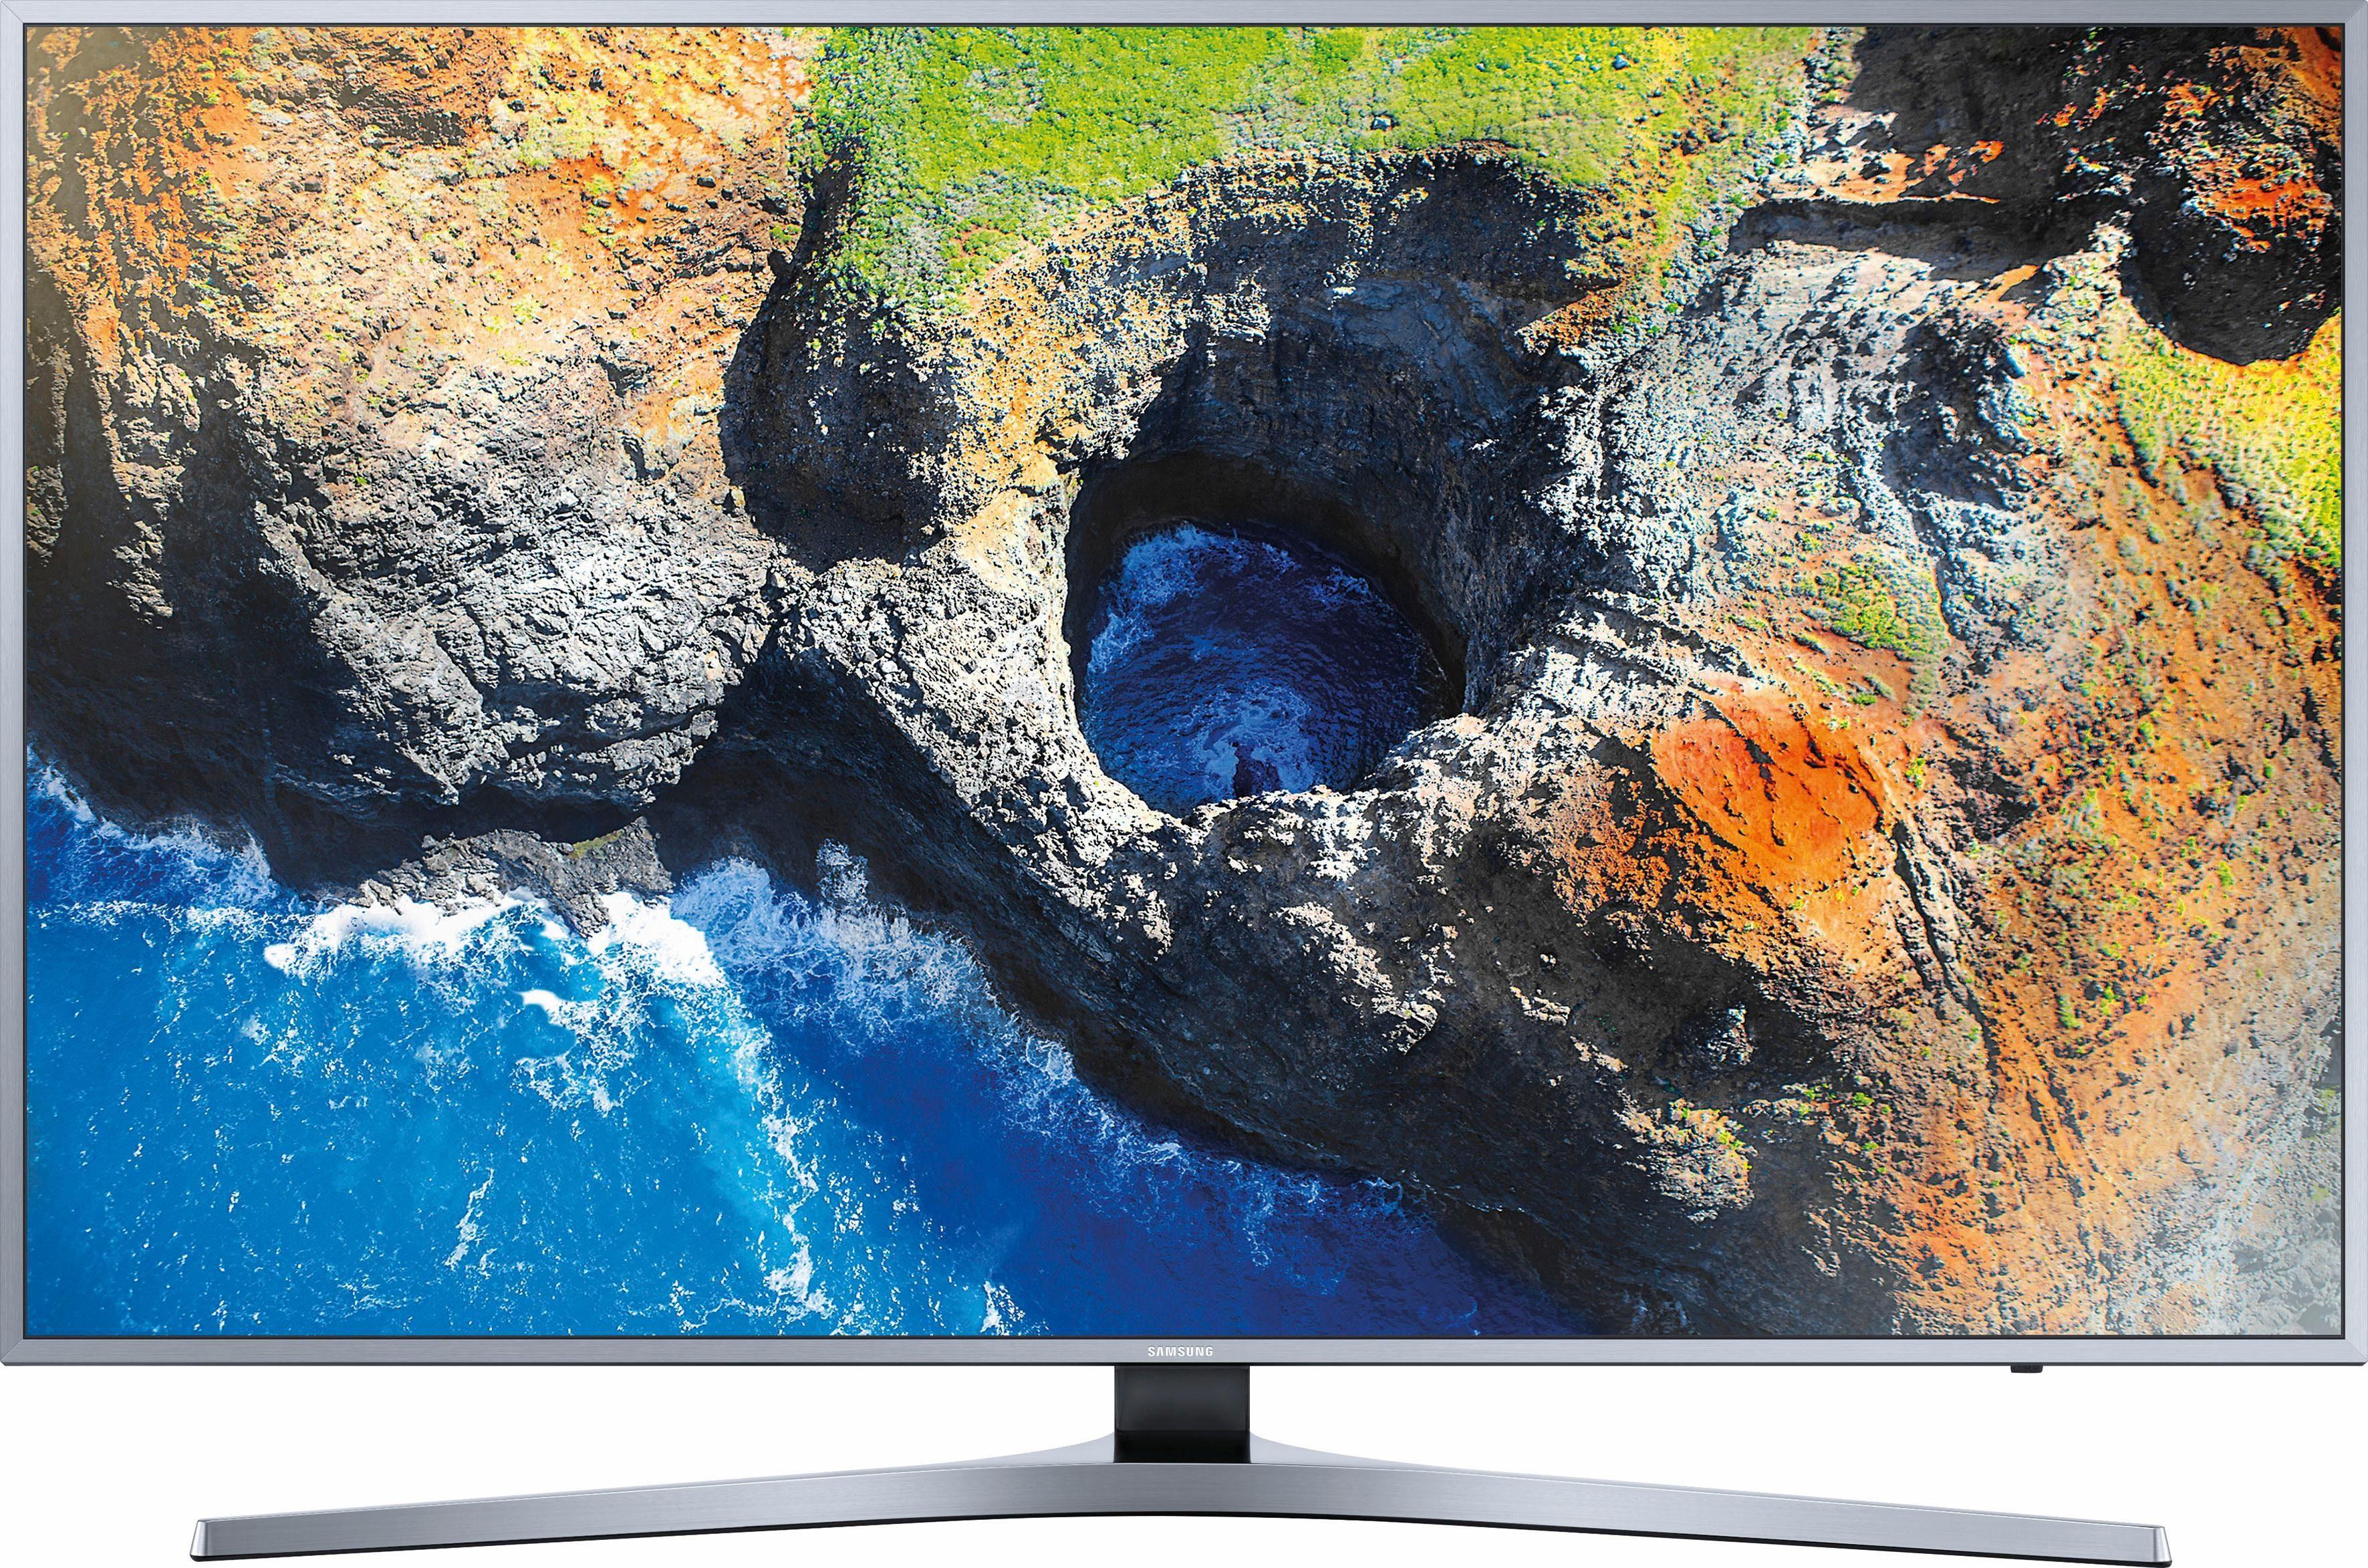 Samsung UE55MU6409UXZG LED-Fernseher (138 cm/55 Zoll, 4K Ultra HD, Smart-TV, 360° Video Player)